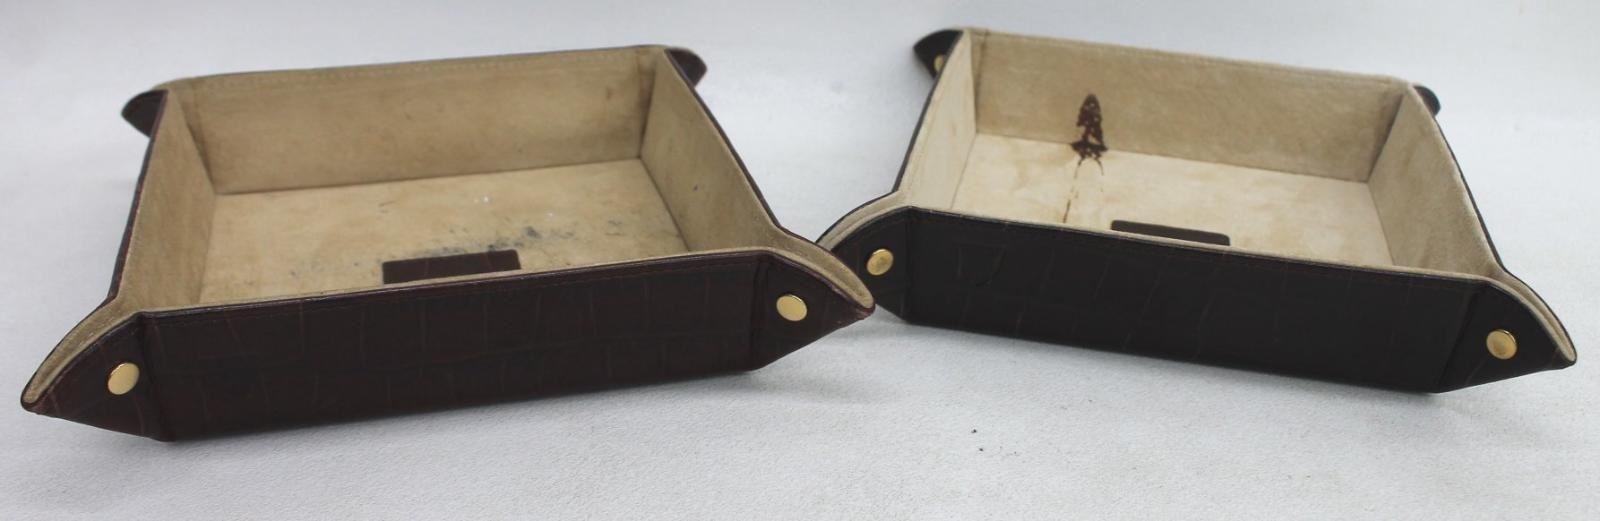 ASPINAL-OF-LONDON-Medium-Brown-Croc-Print-Leather-Tidy-Trays-Trinket-Holders-2x